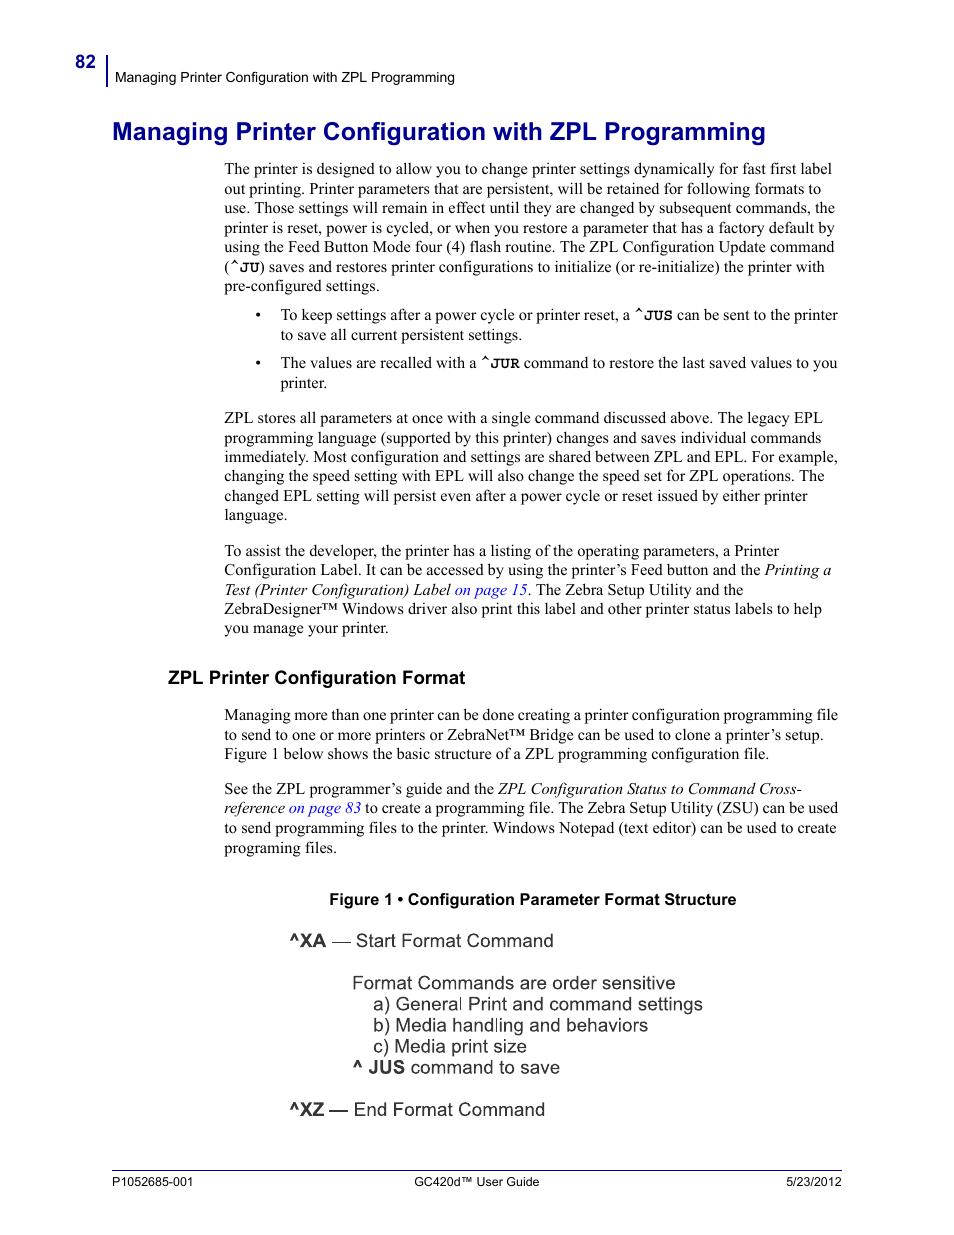 Zpl printer configuration format | Fairbanks Zebra GC420d User